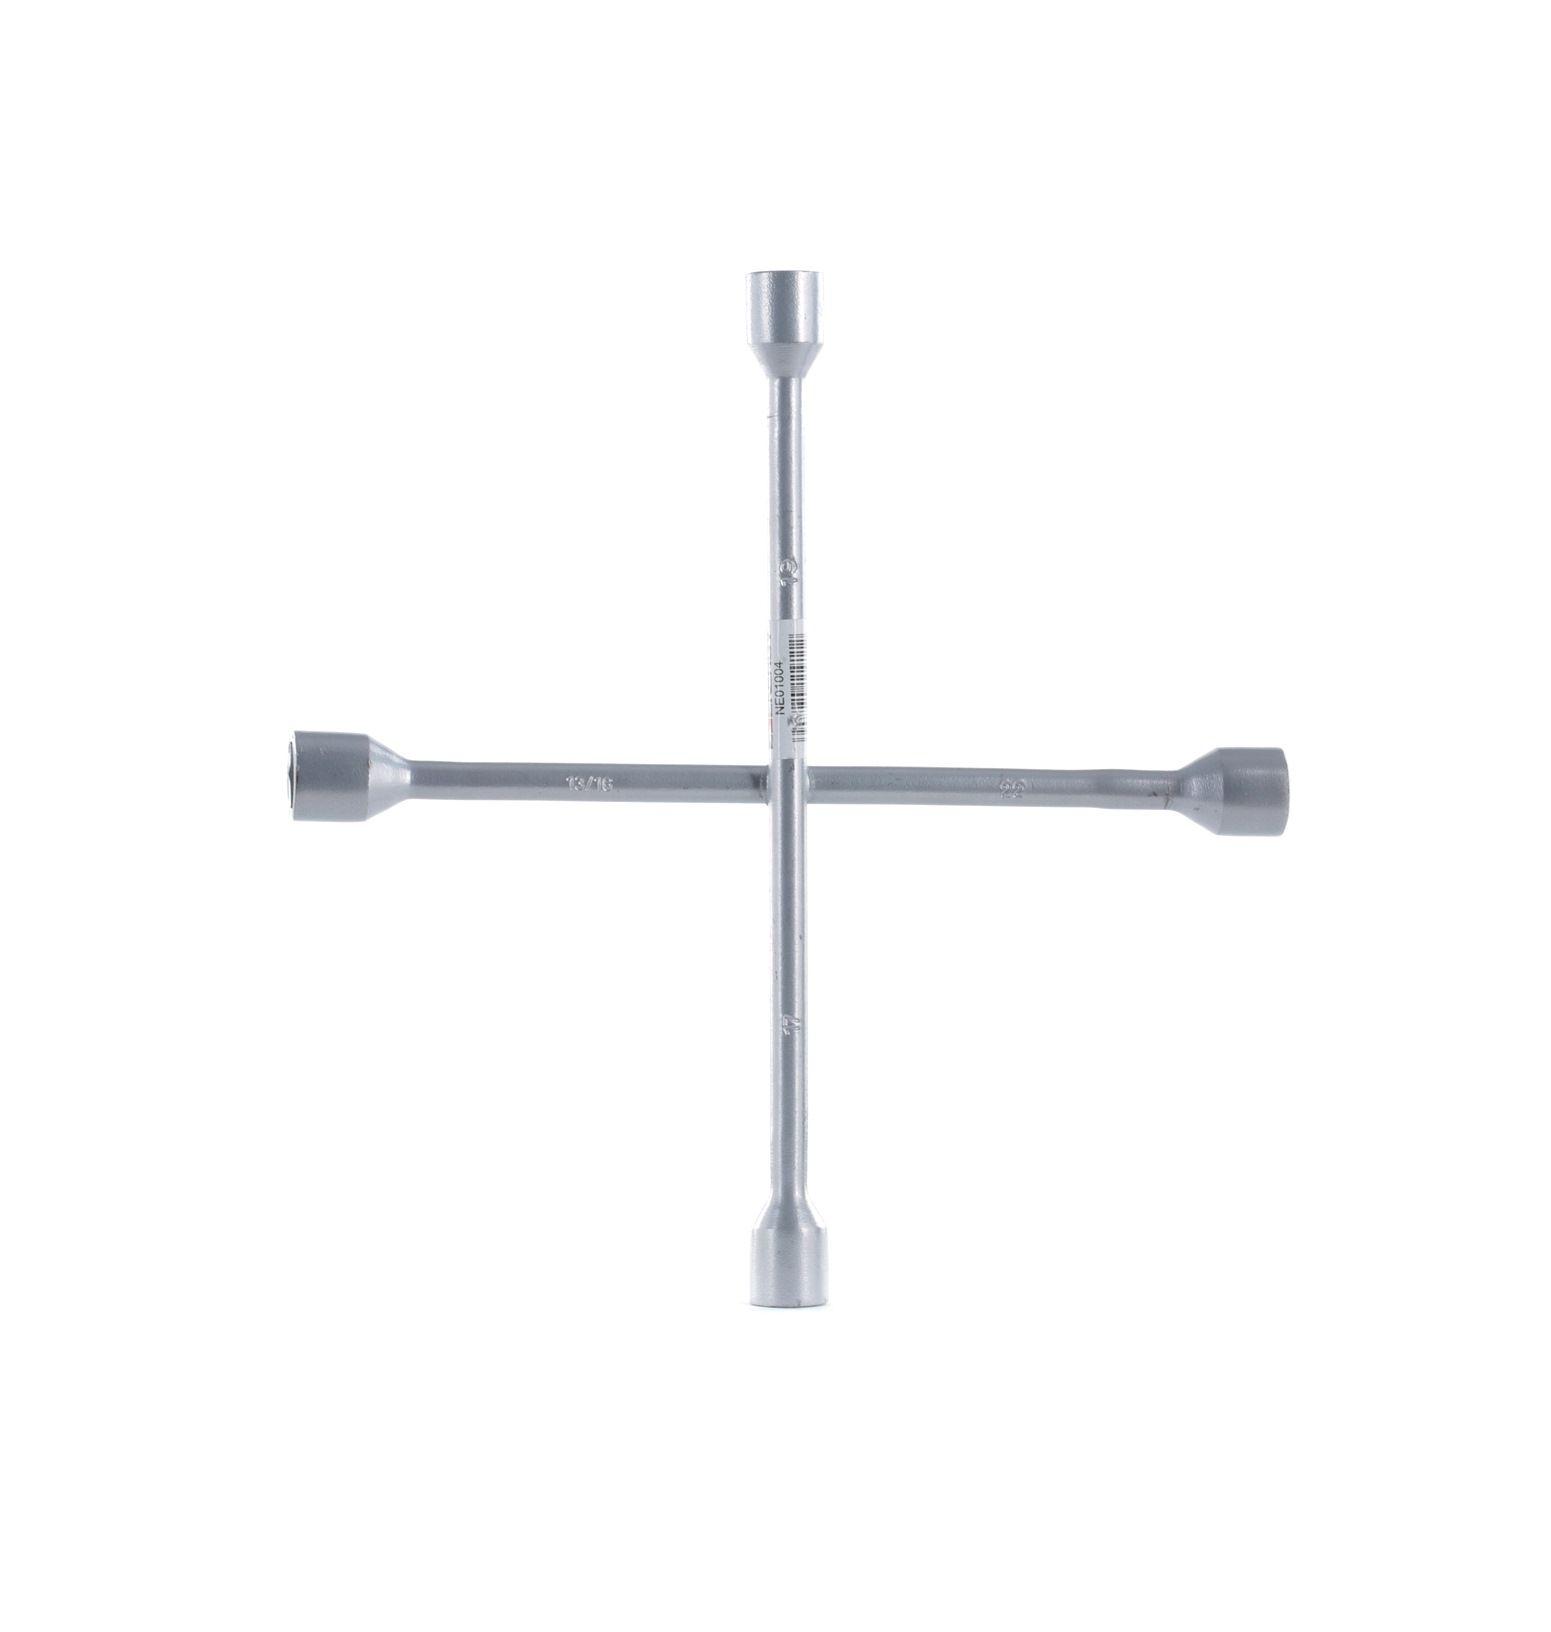 Four-way lug wrench ENERGY NE01004 rating